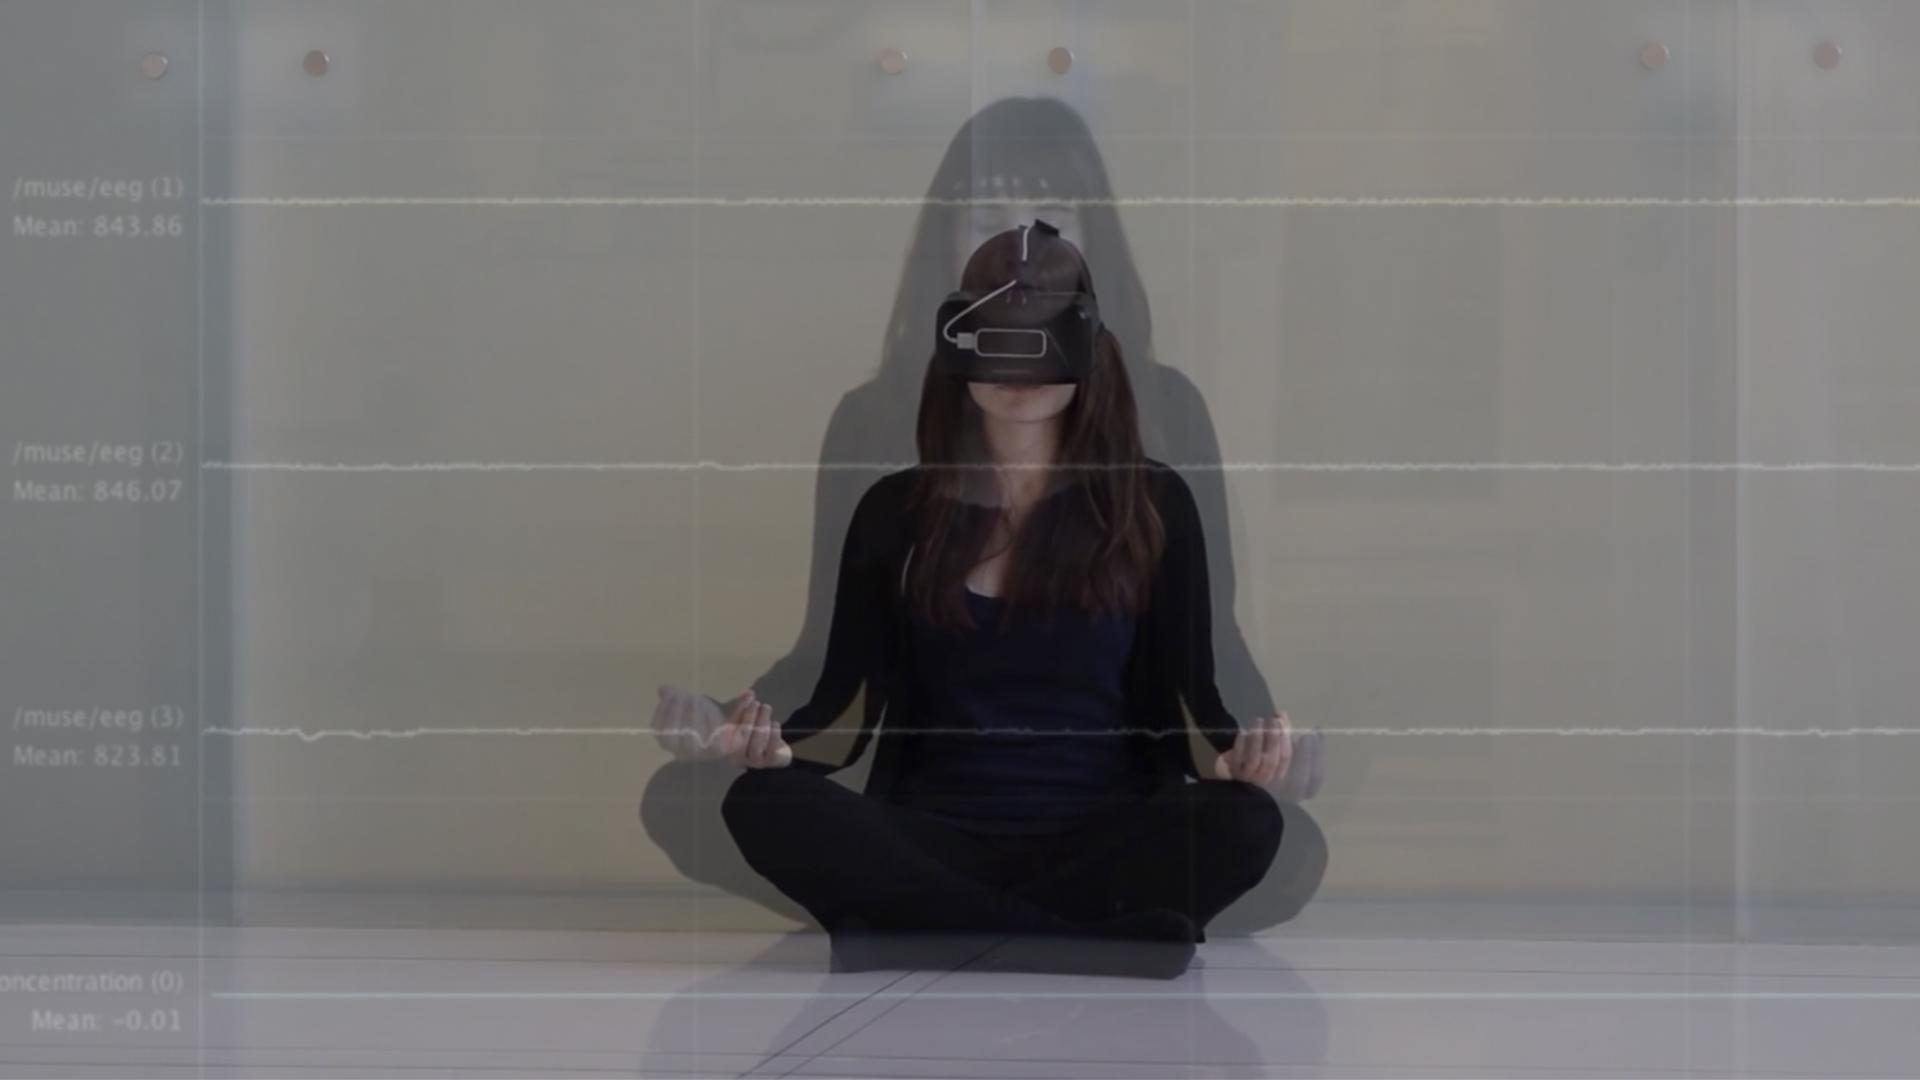 PsychicVR – Judith Amores Website